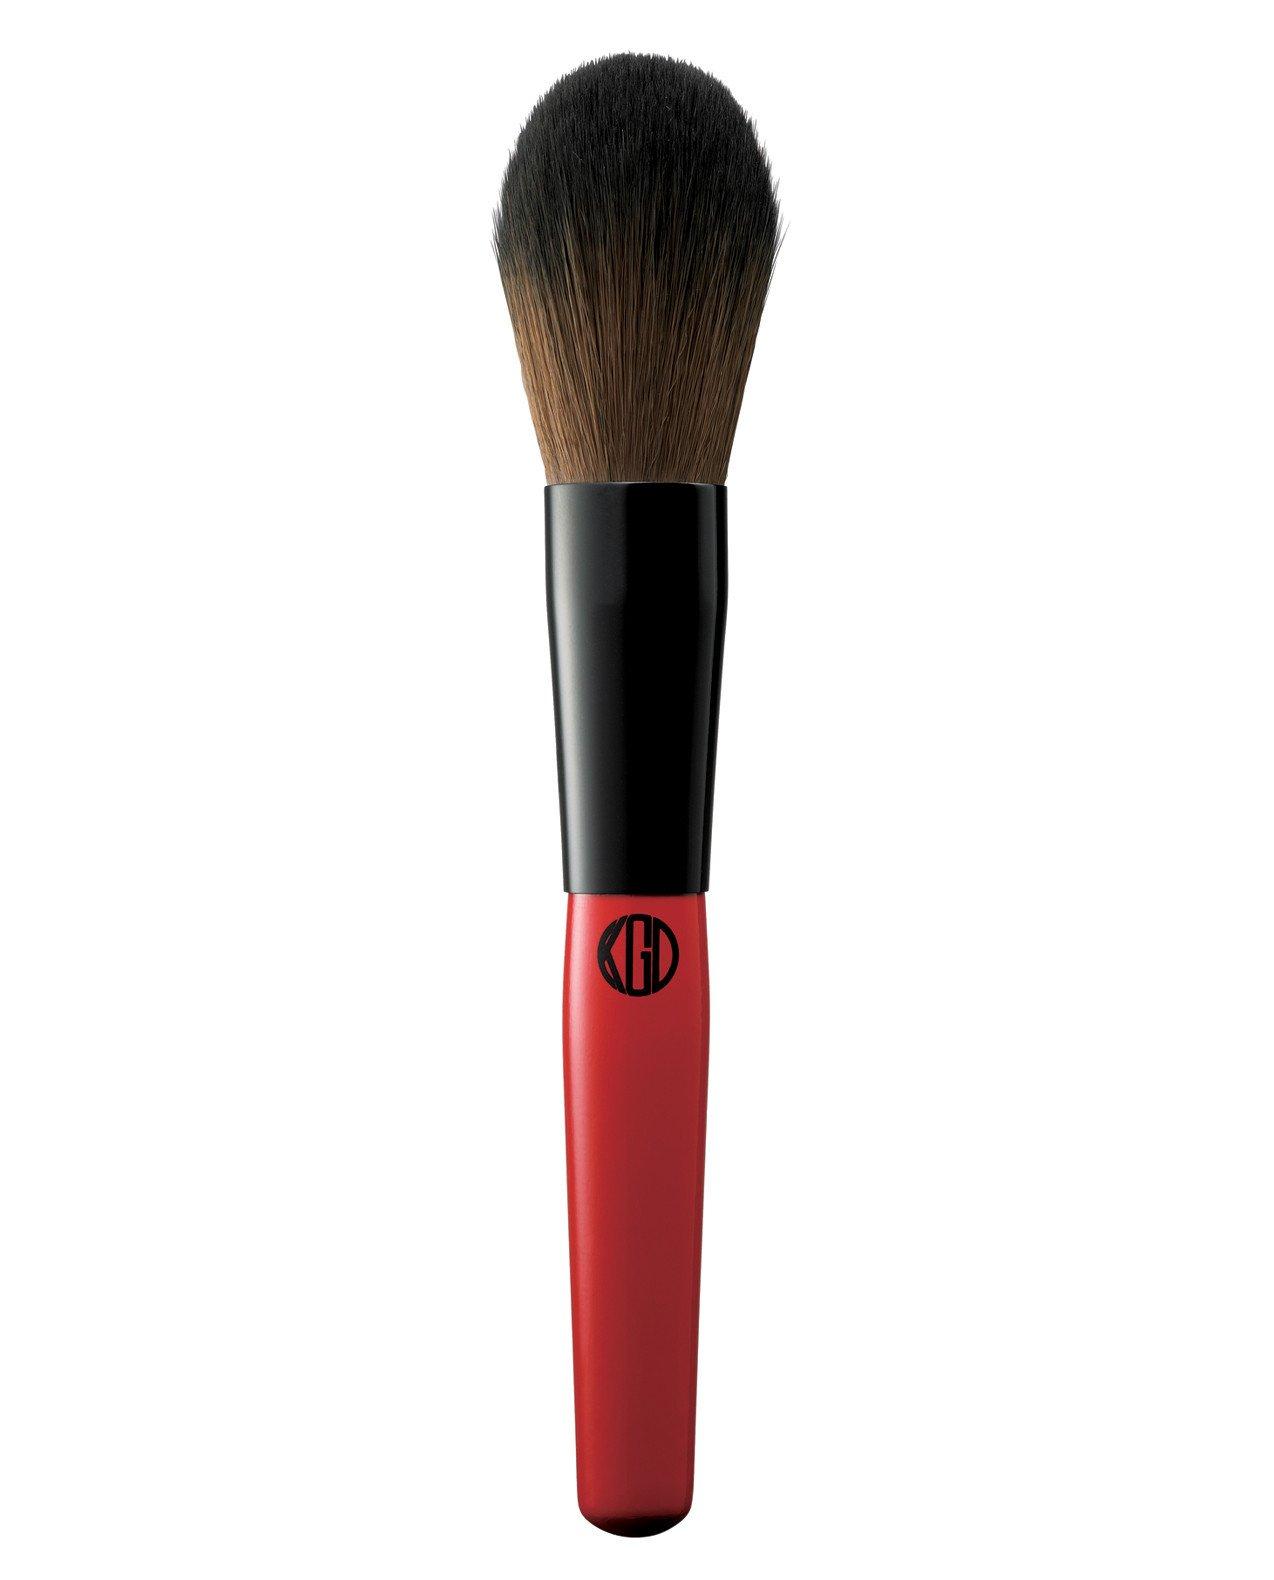 Powder Brush Image